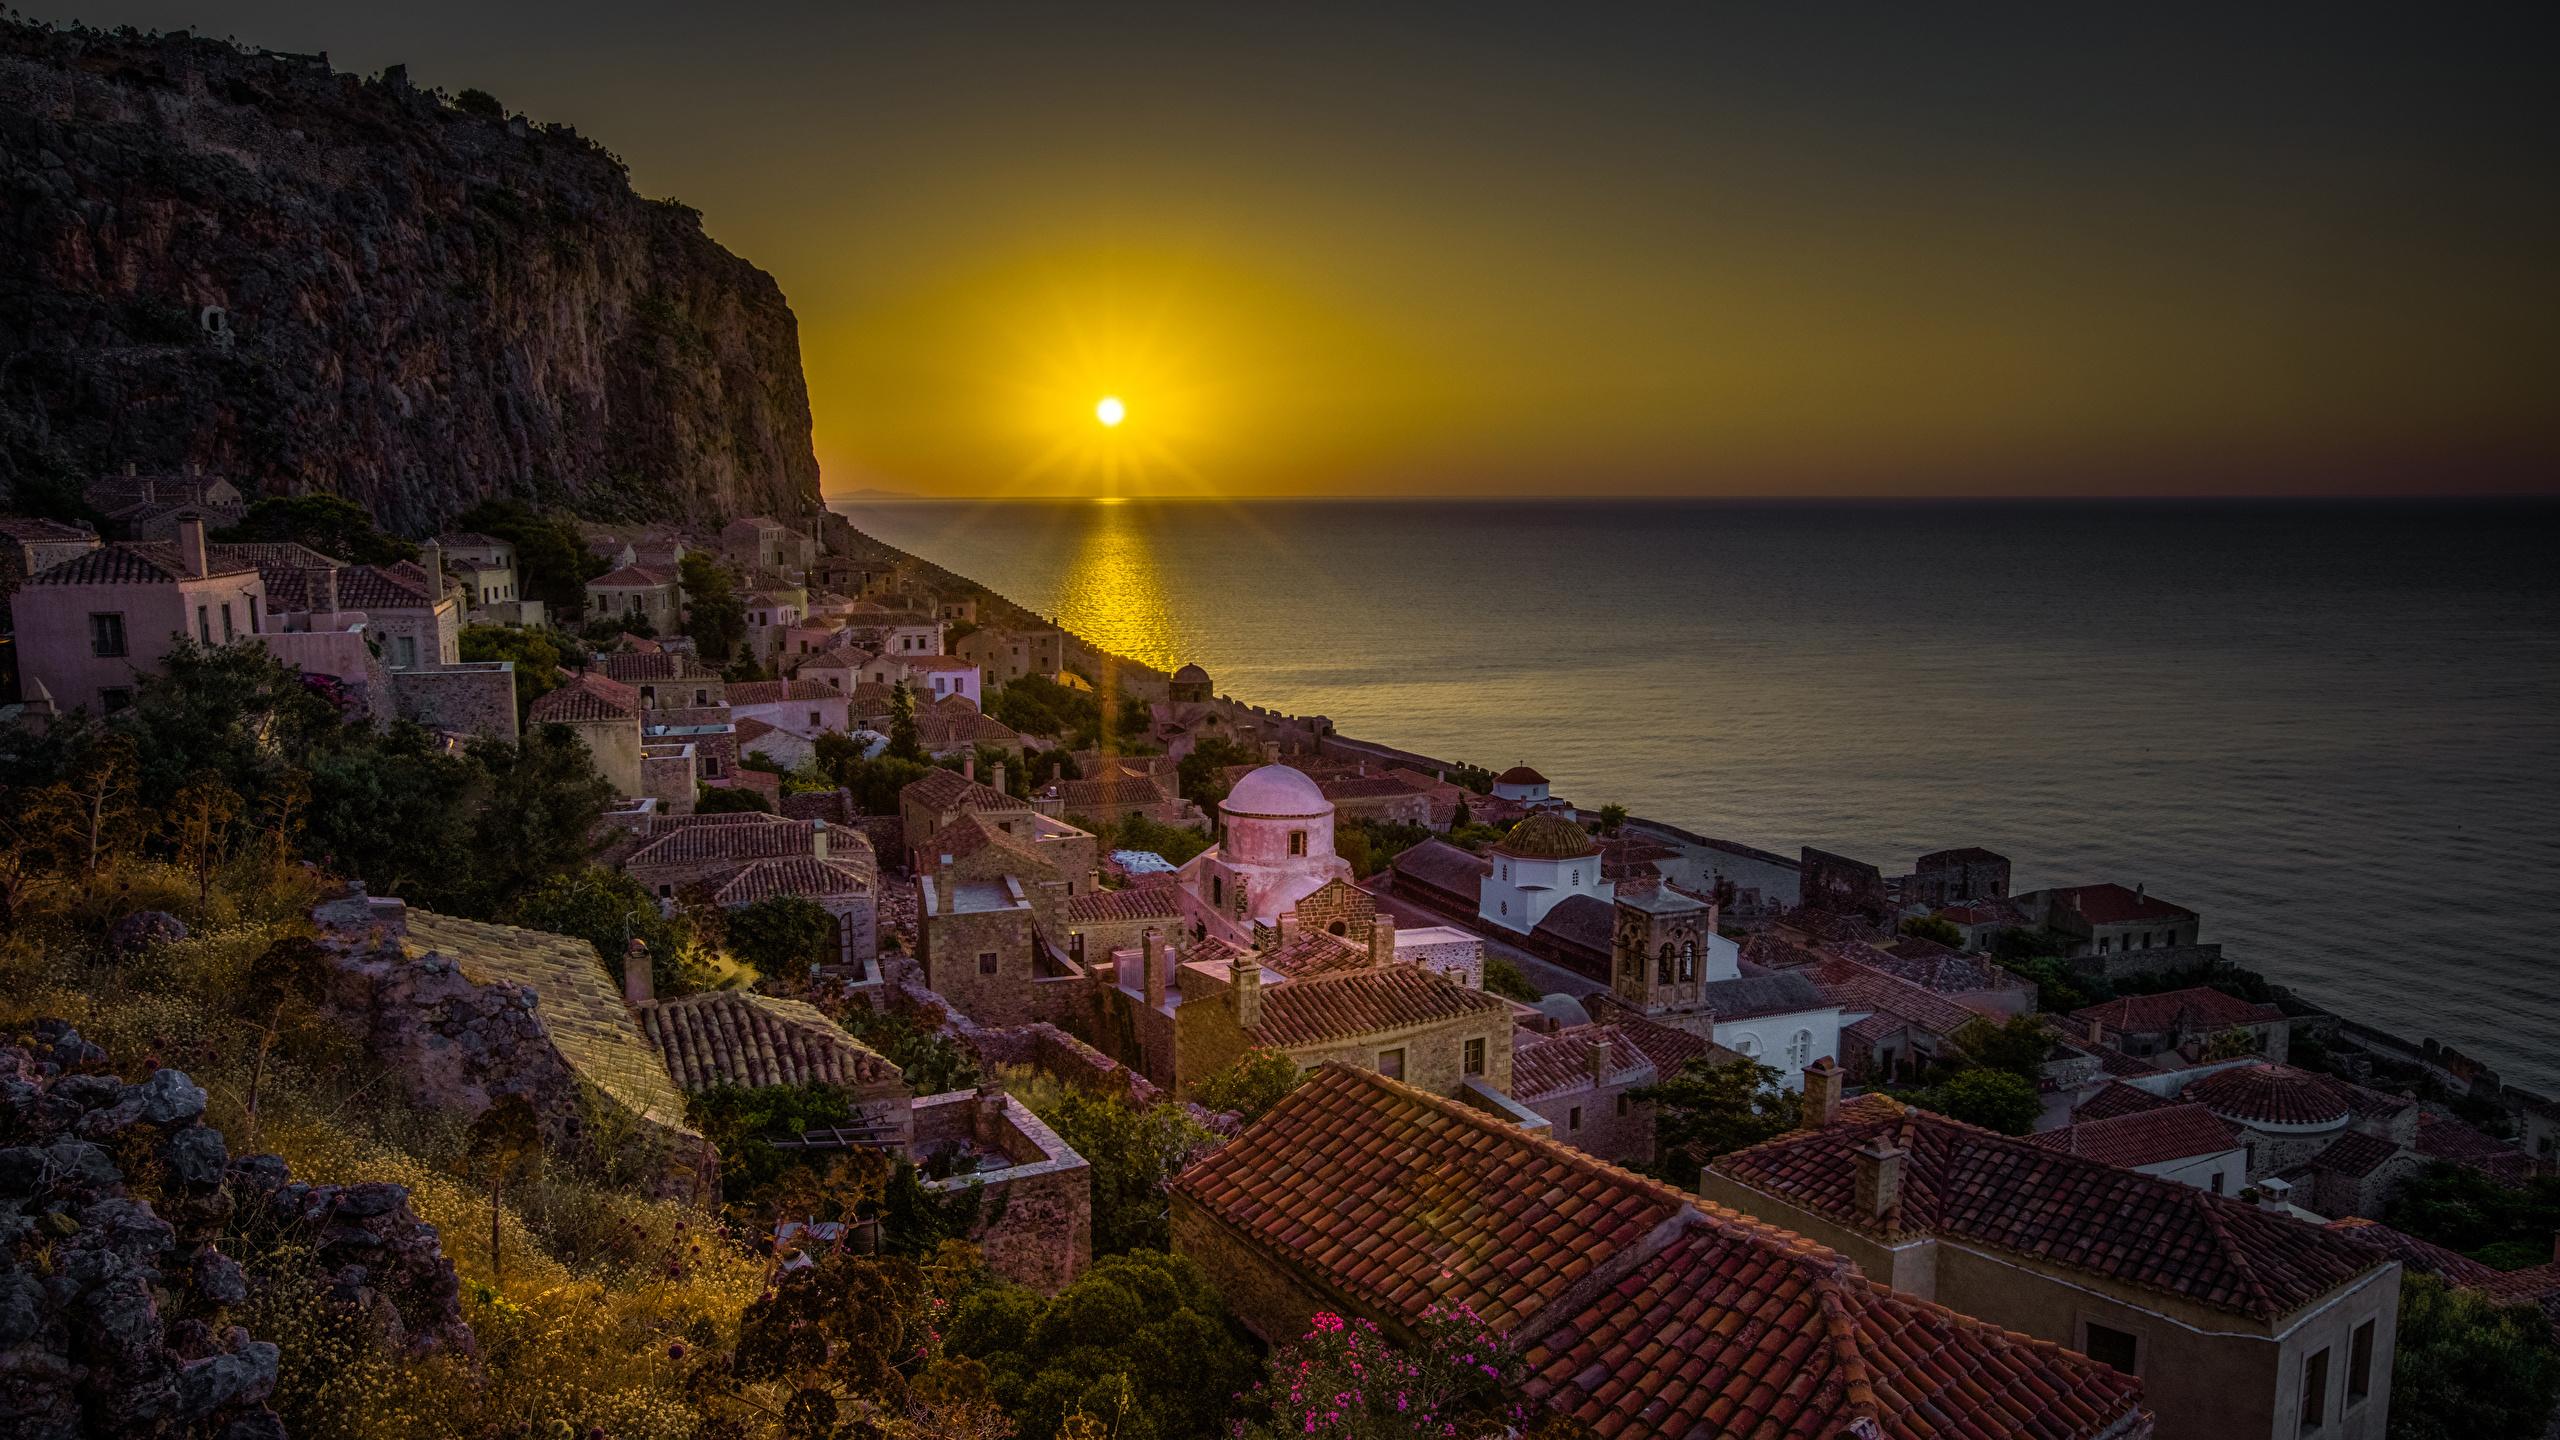 Photos Greece Monemvasia Sun Sea Roof Rock Sunrises and 2560x1440 2560x1440